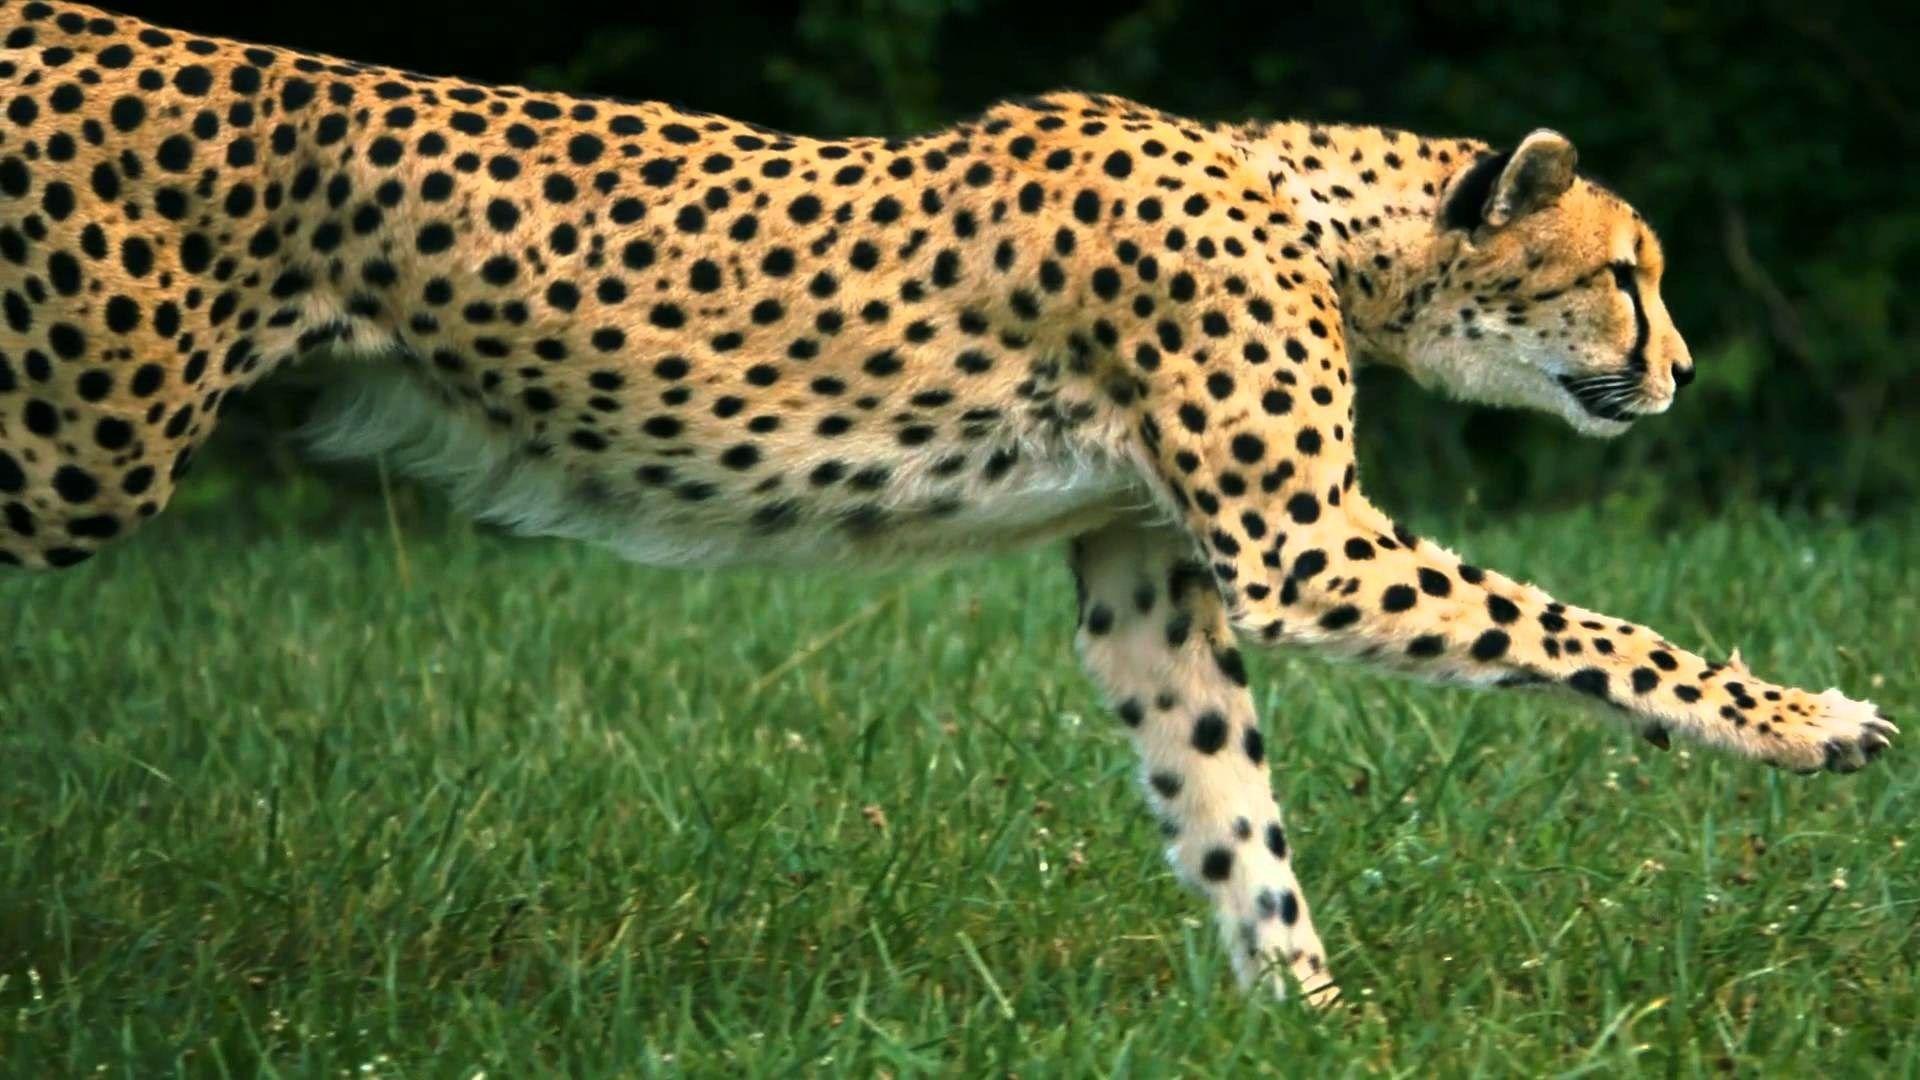 cheetah wallpapers for mac free